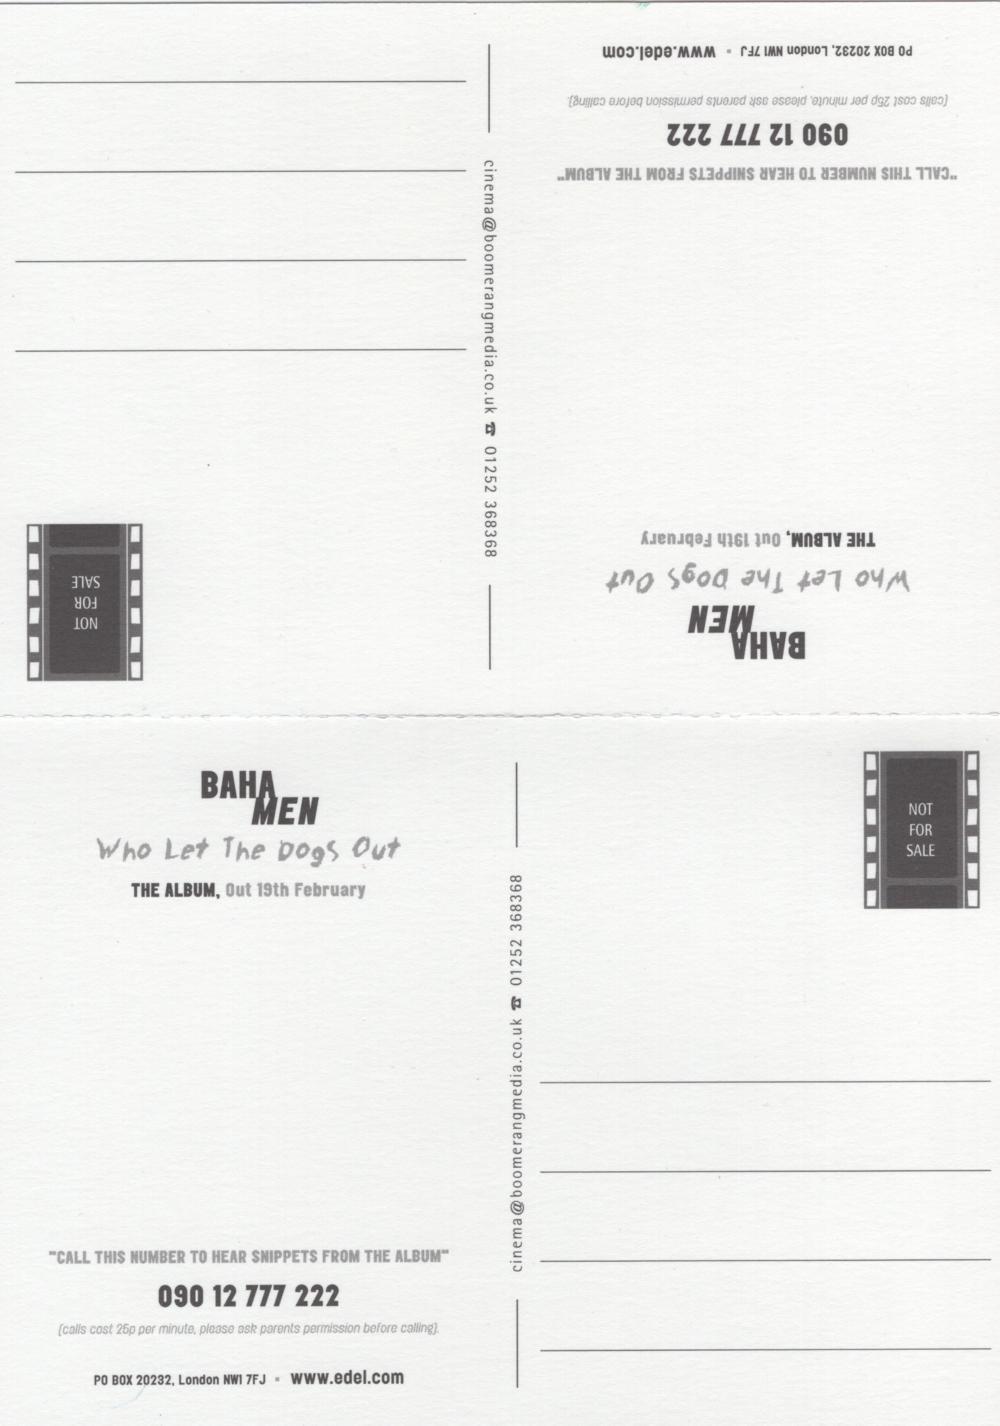 WLWLTDOO-2000-EPHEMERA-BAHA_MEN-PROMO_CARDS-UK-BOOMERANG_MEDIA-BACK.png